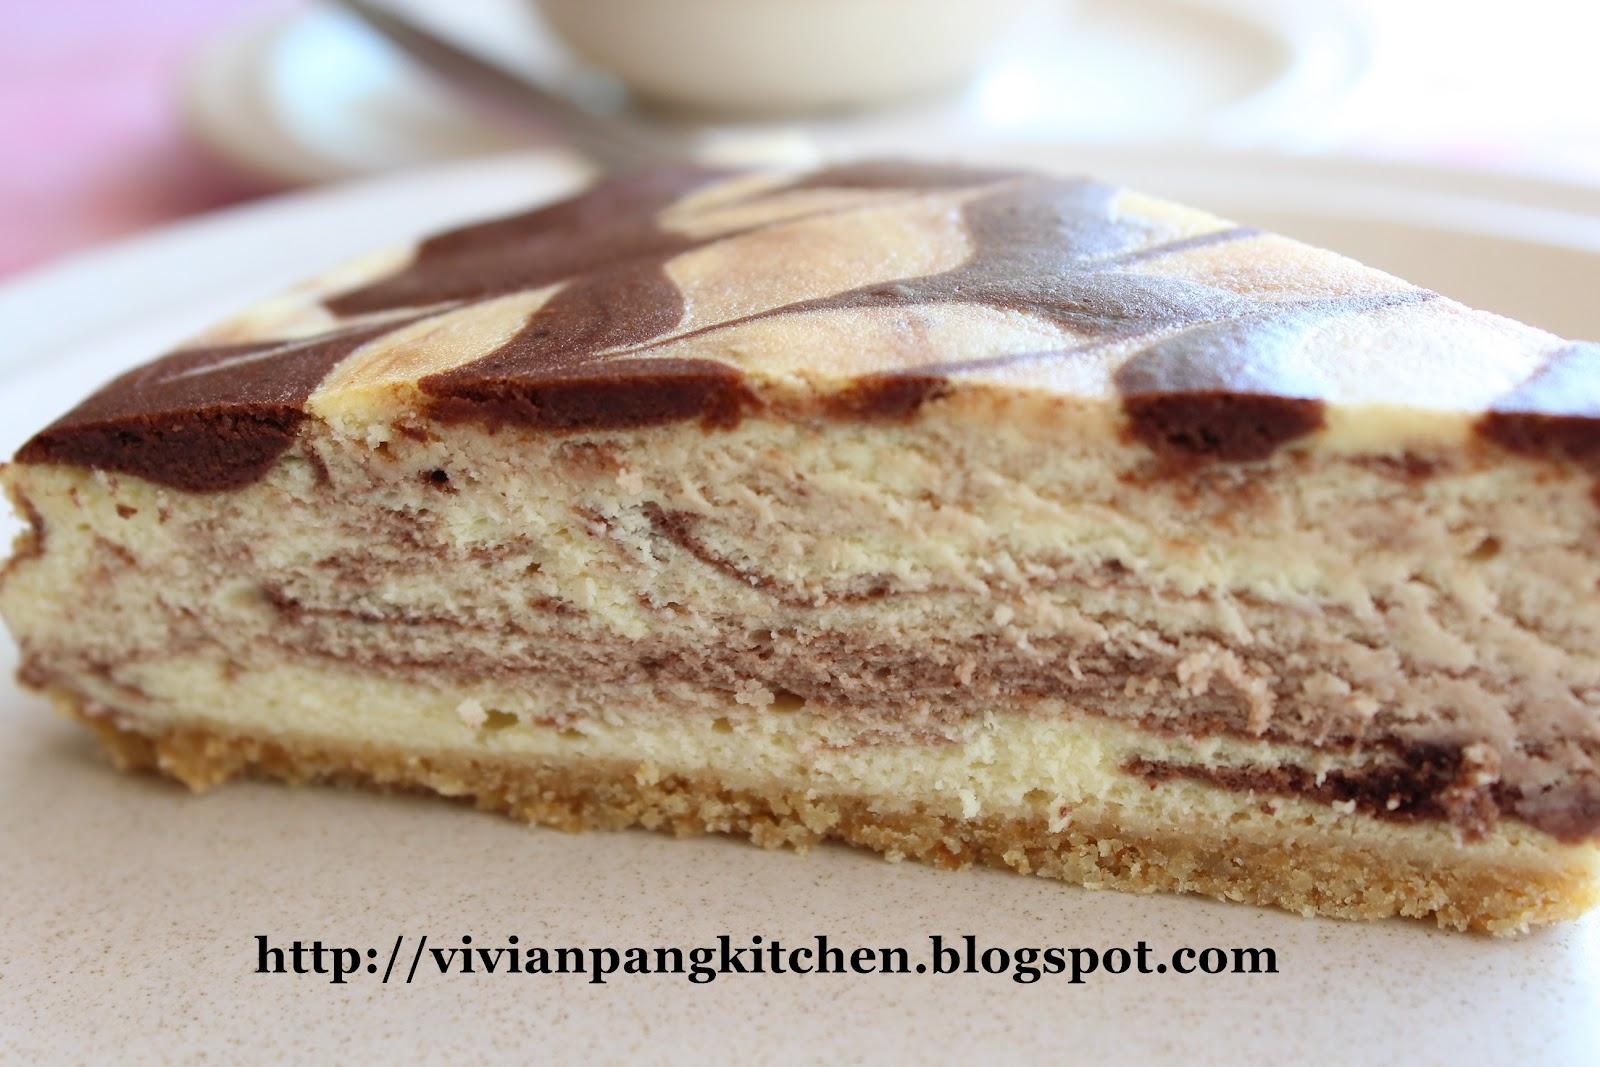 ... cheesecake I want to bake. Until I read Carol's marble cheesecake